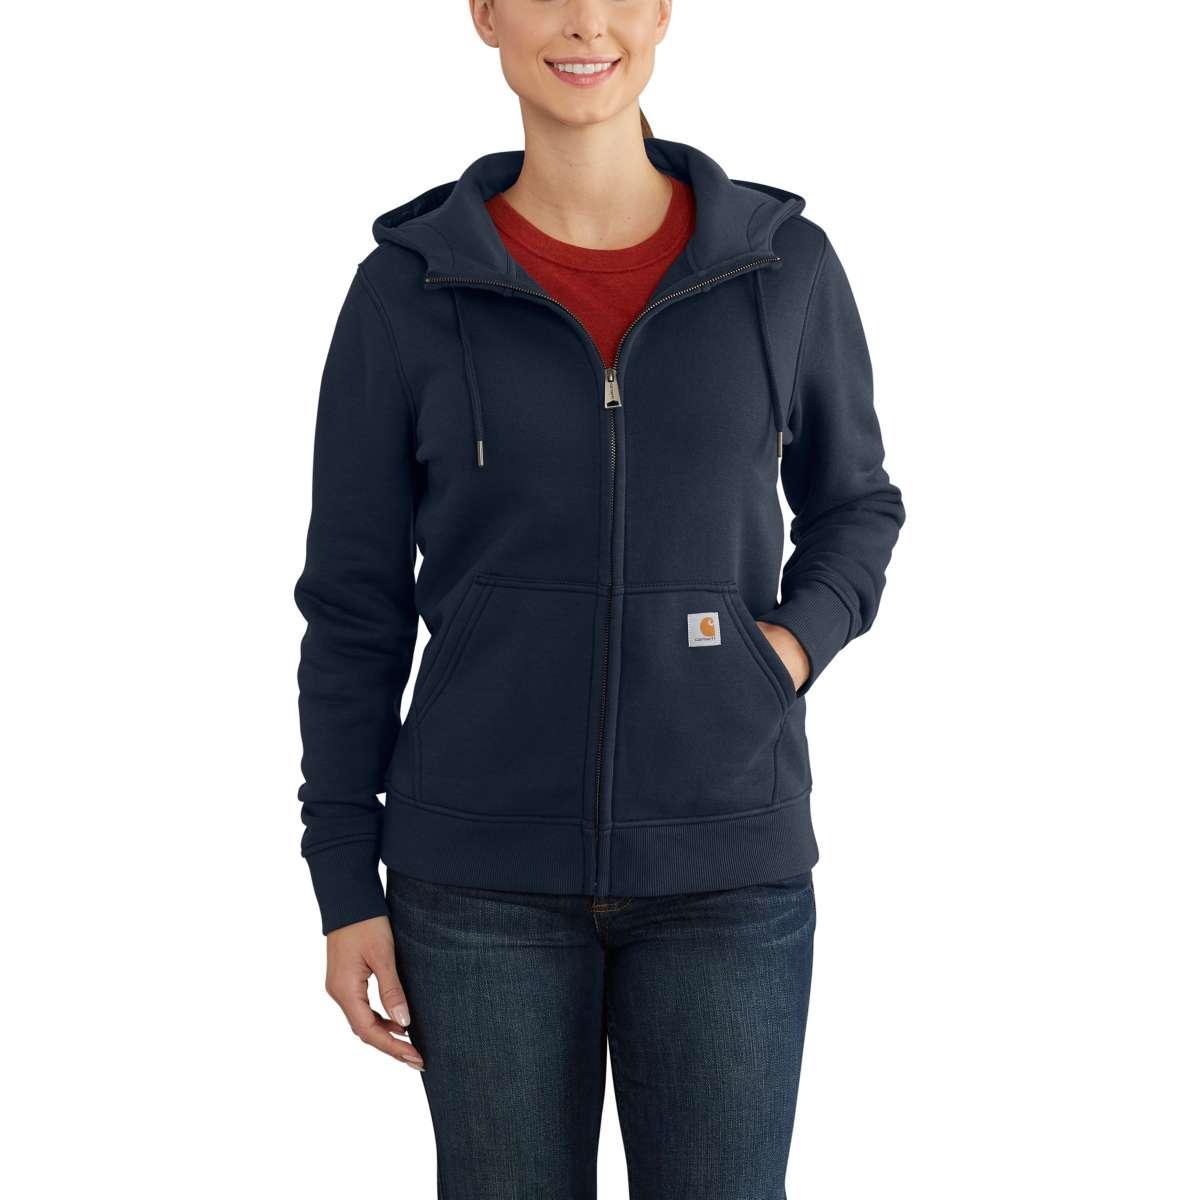 Carhartt Women's Clarksburg Full-Zip Hoodie - Blue, XL